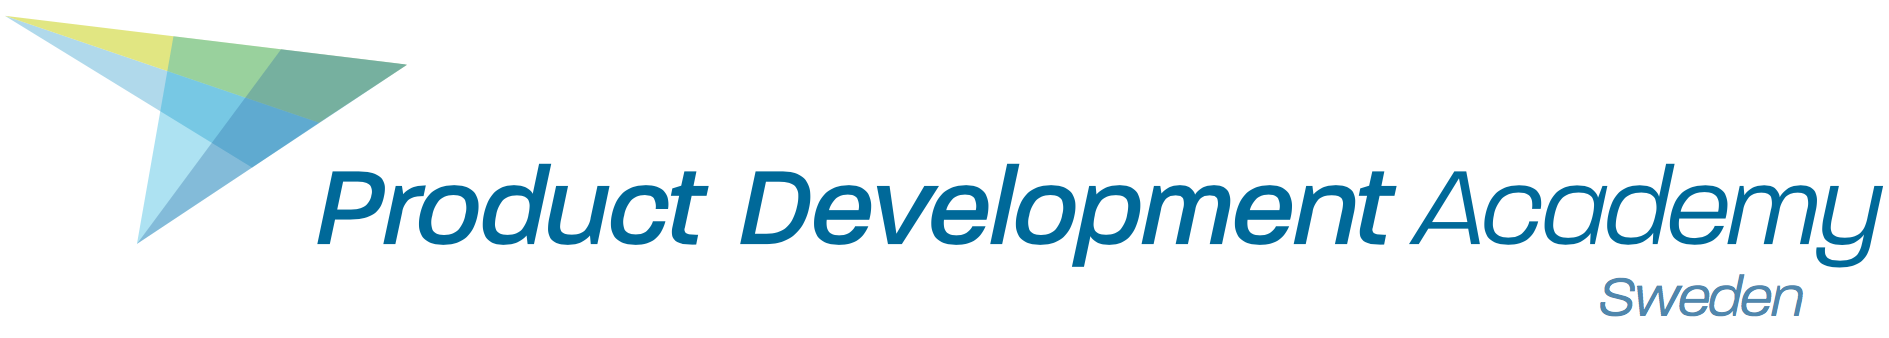 Product Development Academy